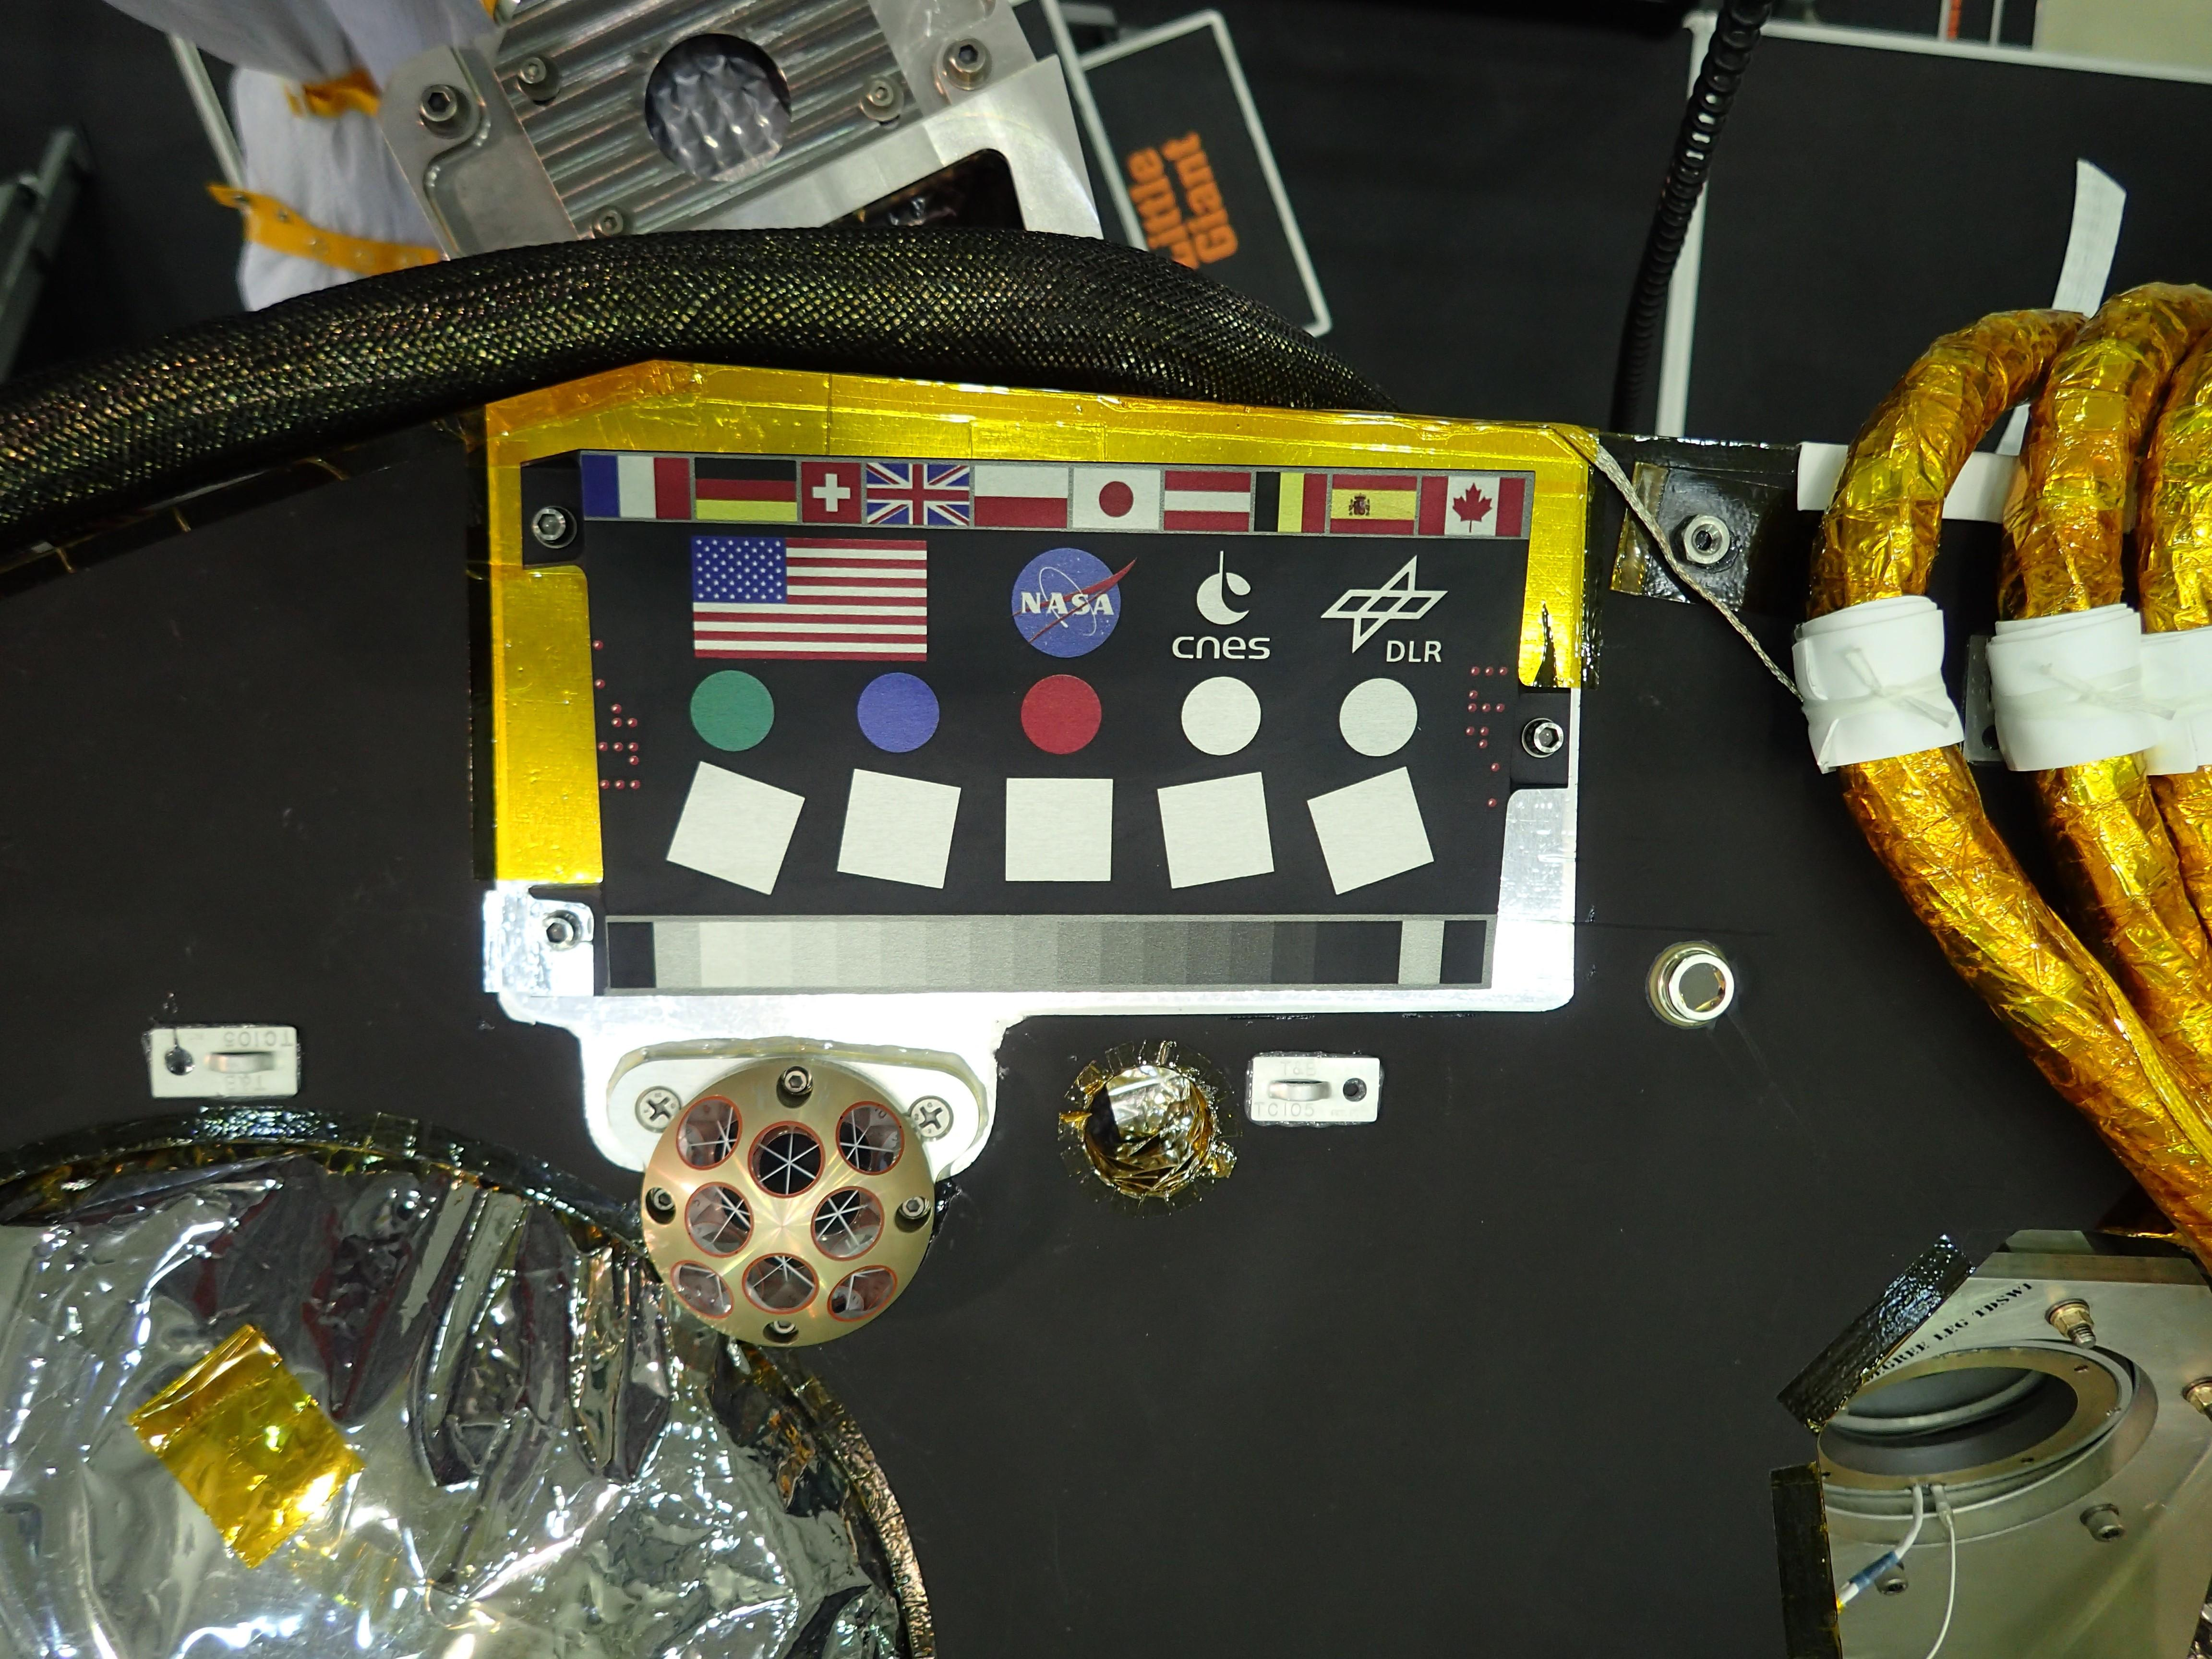 InSight Camera Calibration Target, Laser Retroreflector, and